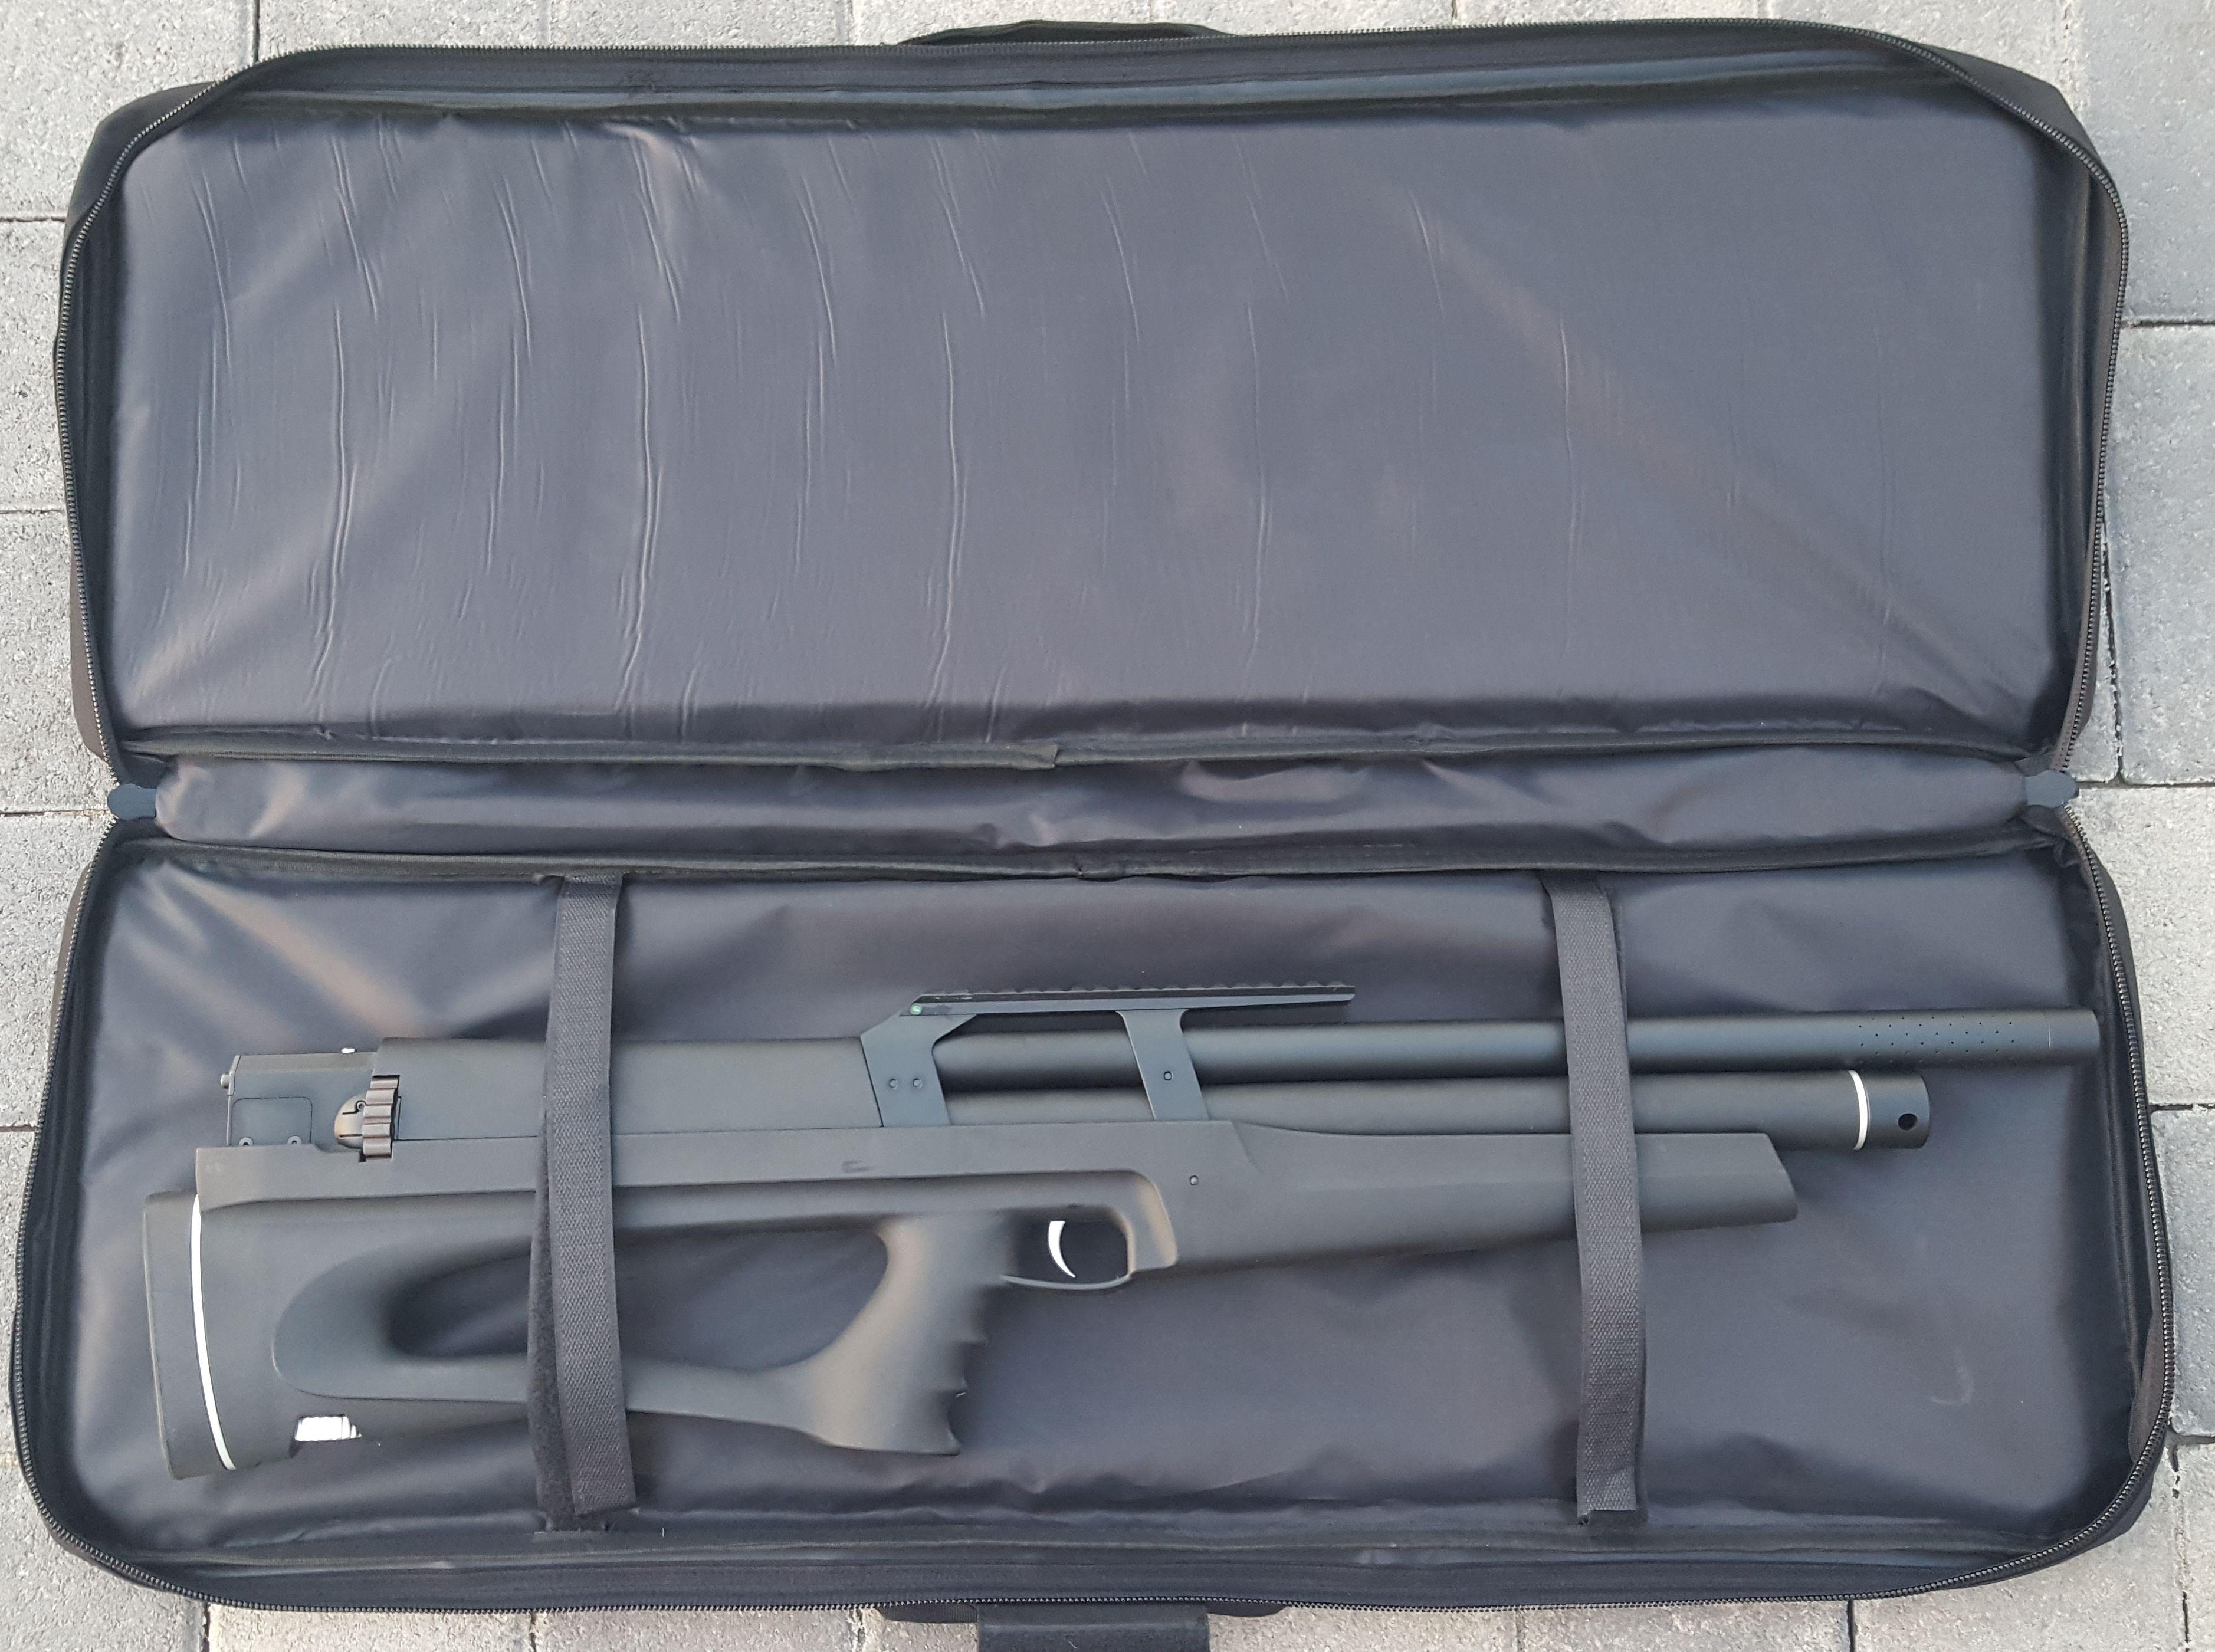 Huben K1 mini review - Airguns & Guns Forum